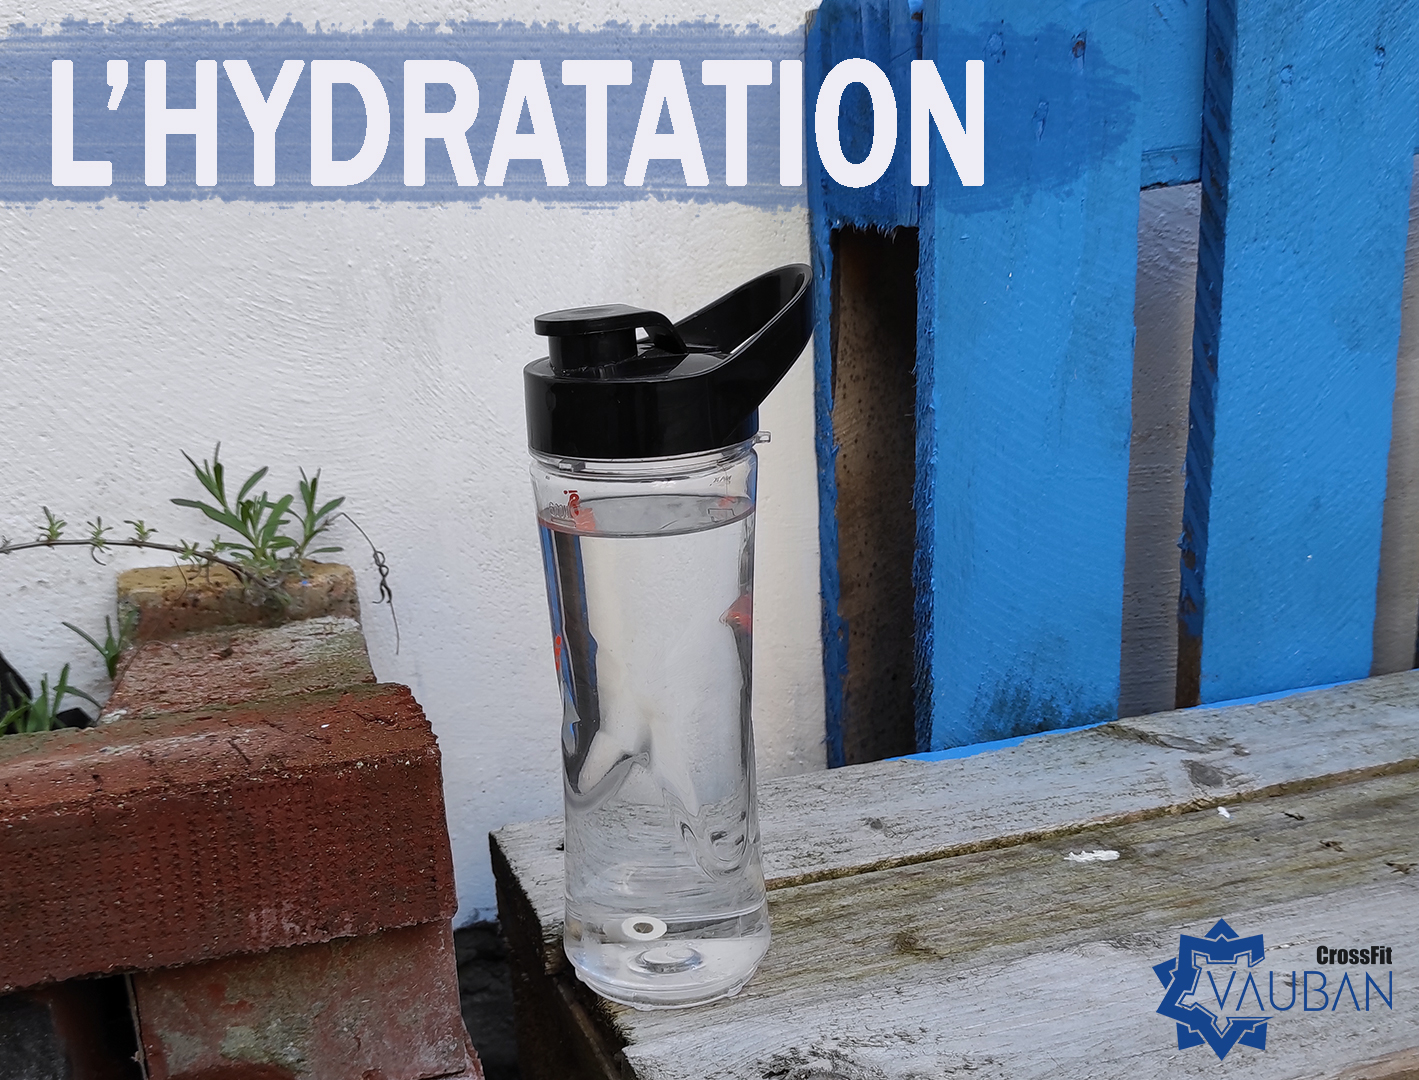 hydratation Lille CrossFit Vauban